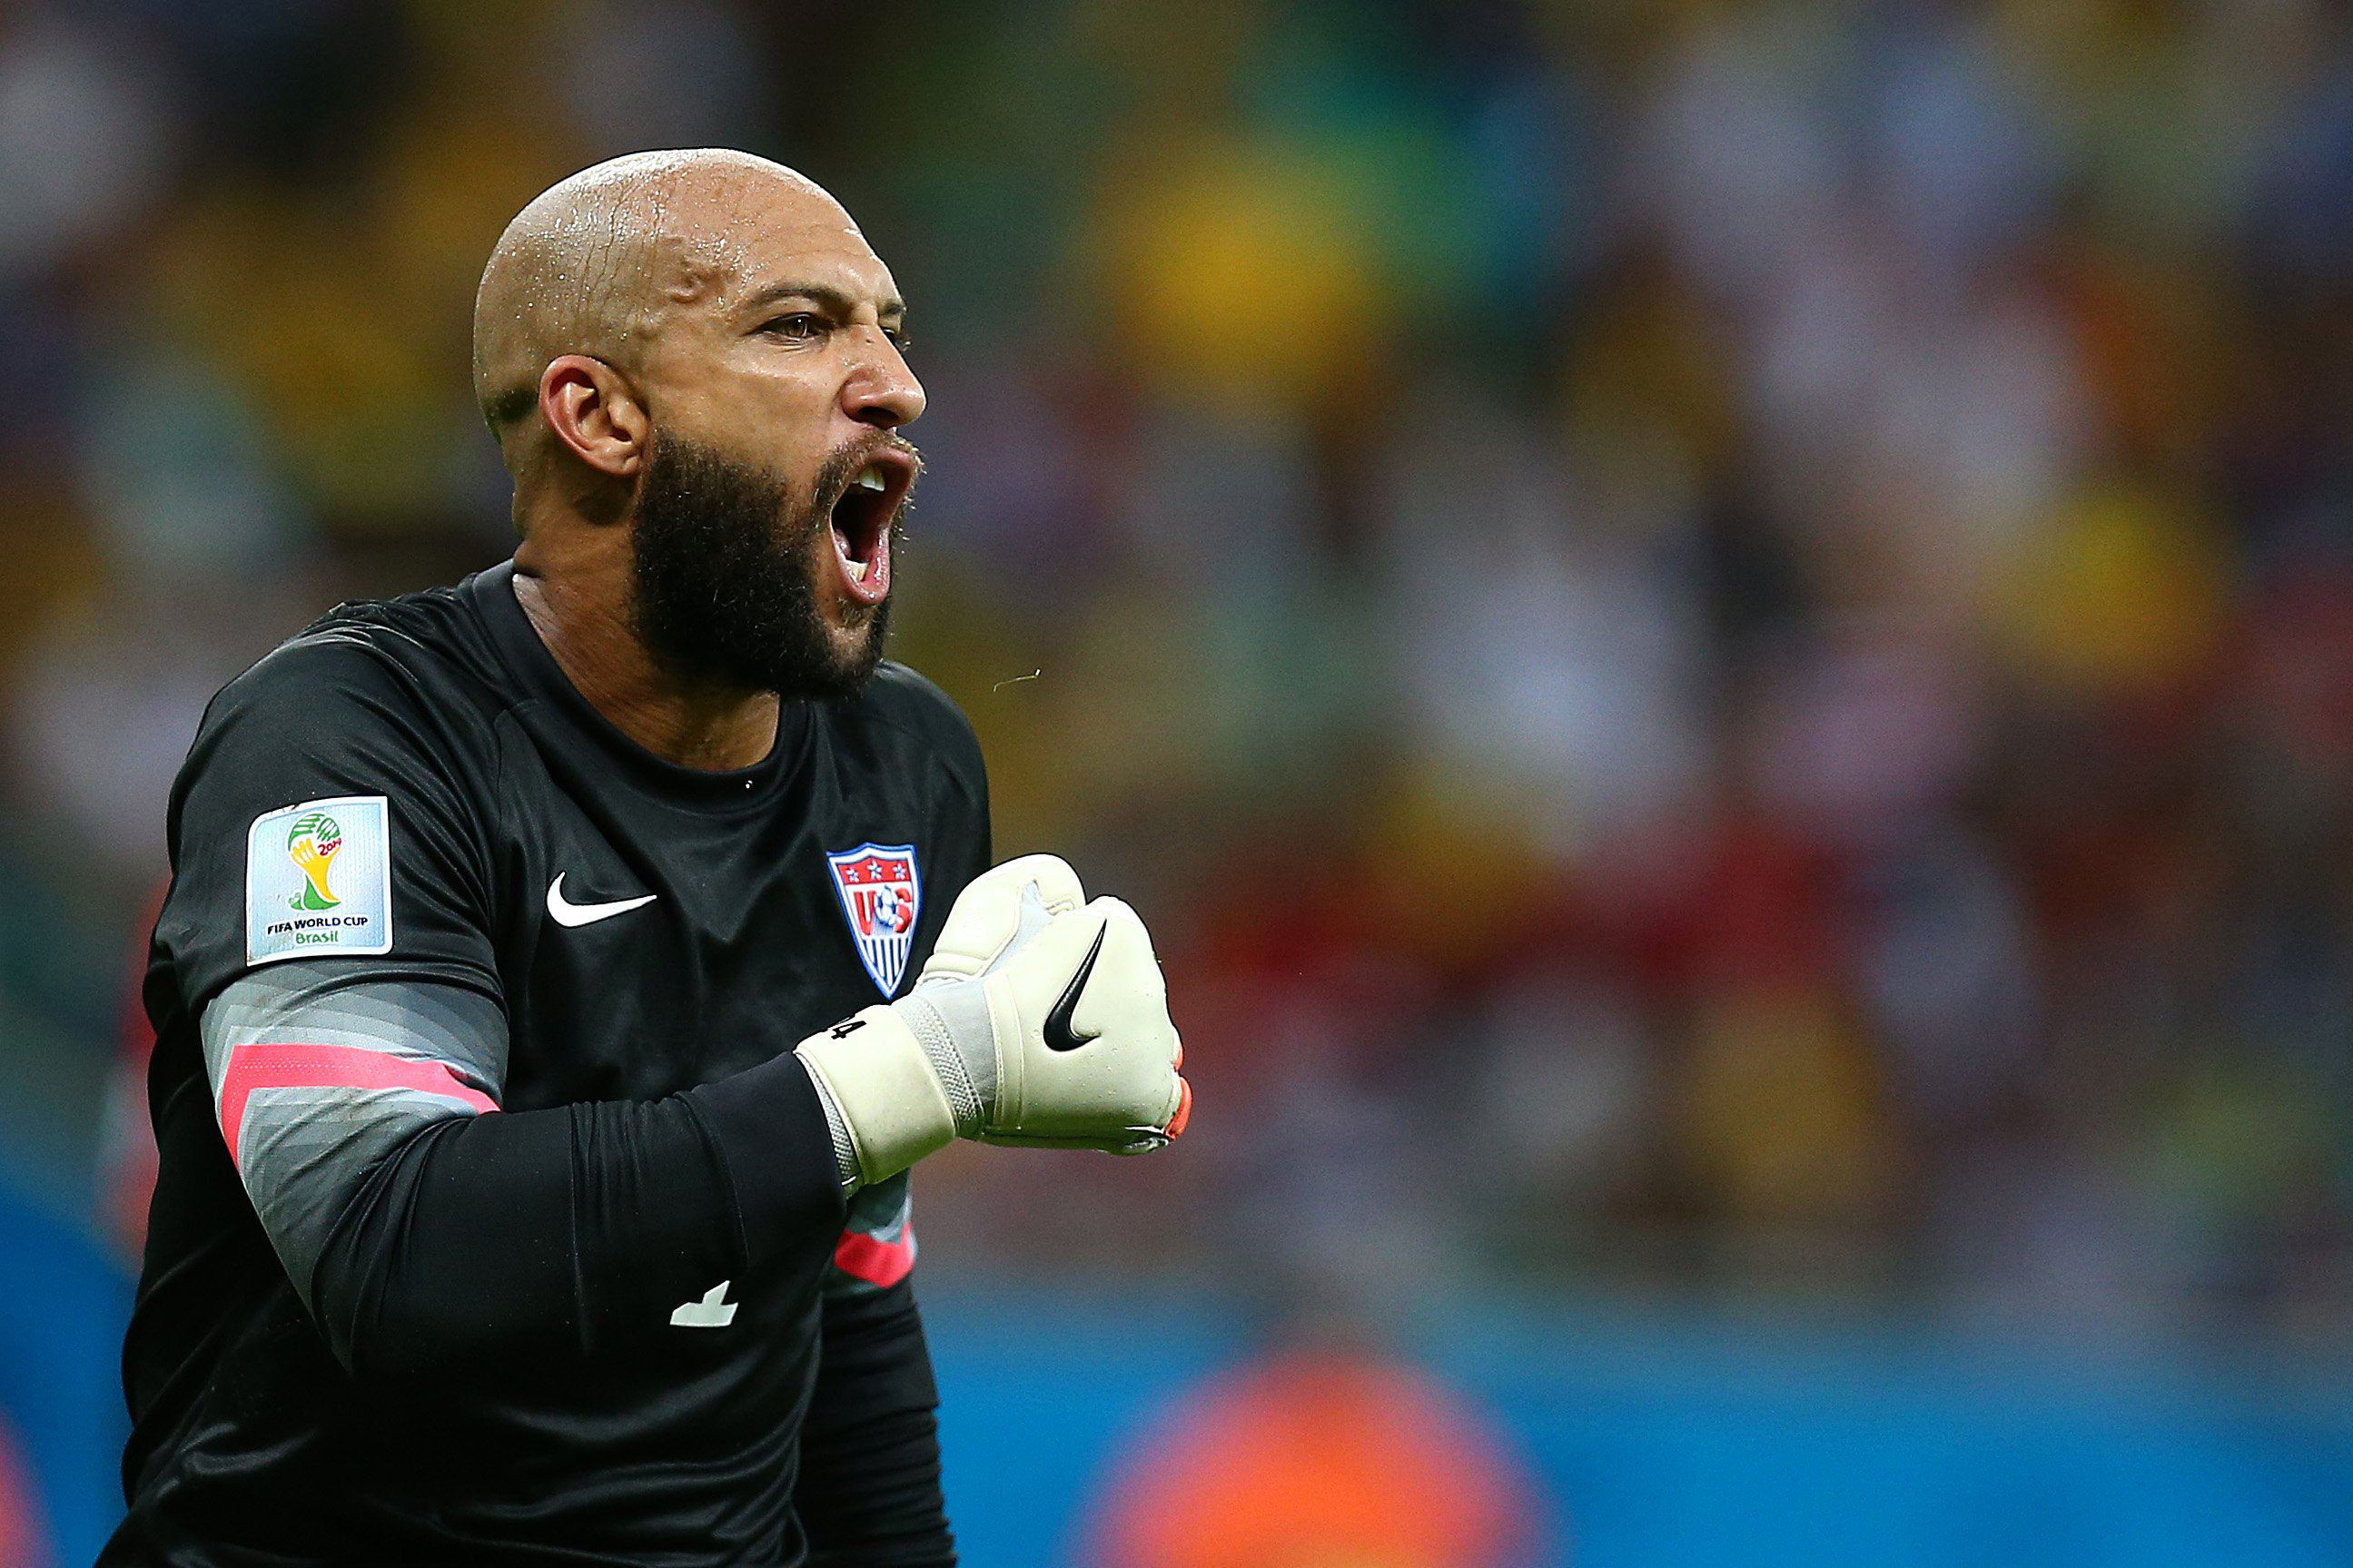 Tim Howard shouts                   during  Belgium - USA game in Arena Fonte Nova, Salvador, Brazil,  July 1.